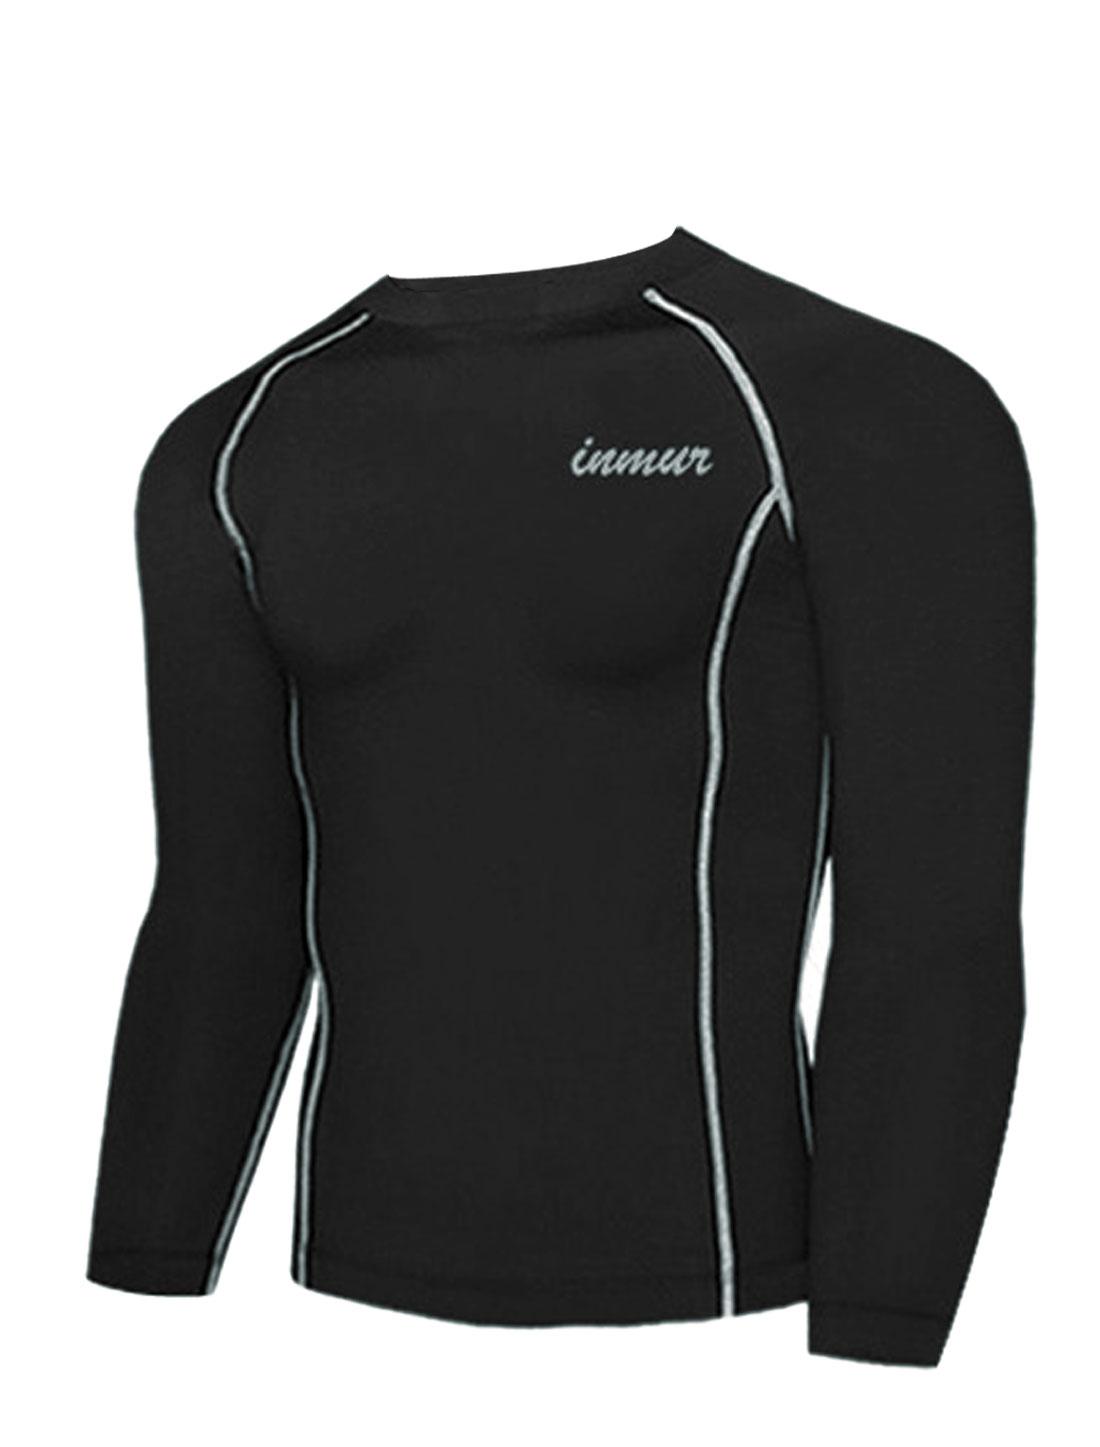 Men Pullover Letters Detail Fashionable Sport Shirt Black M